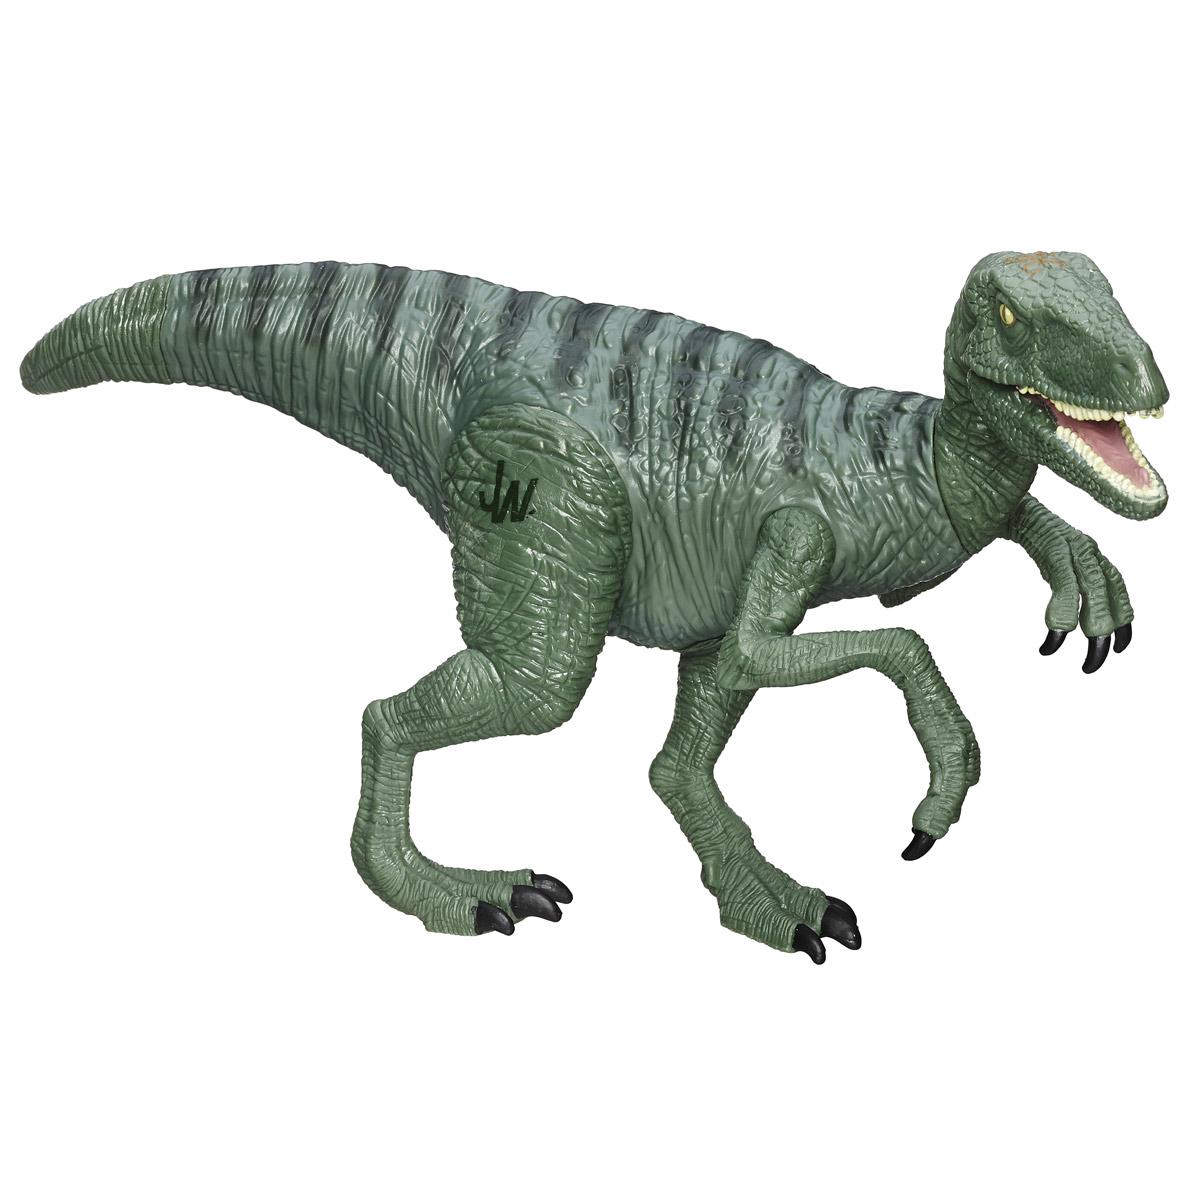 ������� Jurassic World ������: Velociraptor Charlie - Jurassic WorldB1139 B1140_ VELOCIRAPTOR  CHARLIE������� ��������� Jurassic World ������: Velociraptor Charlie ���������� ���������� ������ �������! ��������� ������������ �������� ���������� ��������� ���� � �������������� ������ ������ ������� �������� ��� ������ �����. ������������ ����� - ����� ������������ �������, ������� �������� �������� ������������ � ����������� ��������� ���� ���������. ������� ����������� �� ���������� � �������� ����������, �� ������� ������ ����������� ����������� ���� ������� ������. ������� ���������� ������� ���������. ��� ������� ������ ����� ������ � ��������, ���������� ��������� �������. ��������� ��� ����� ������������� ��������!